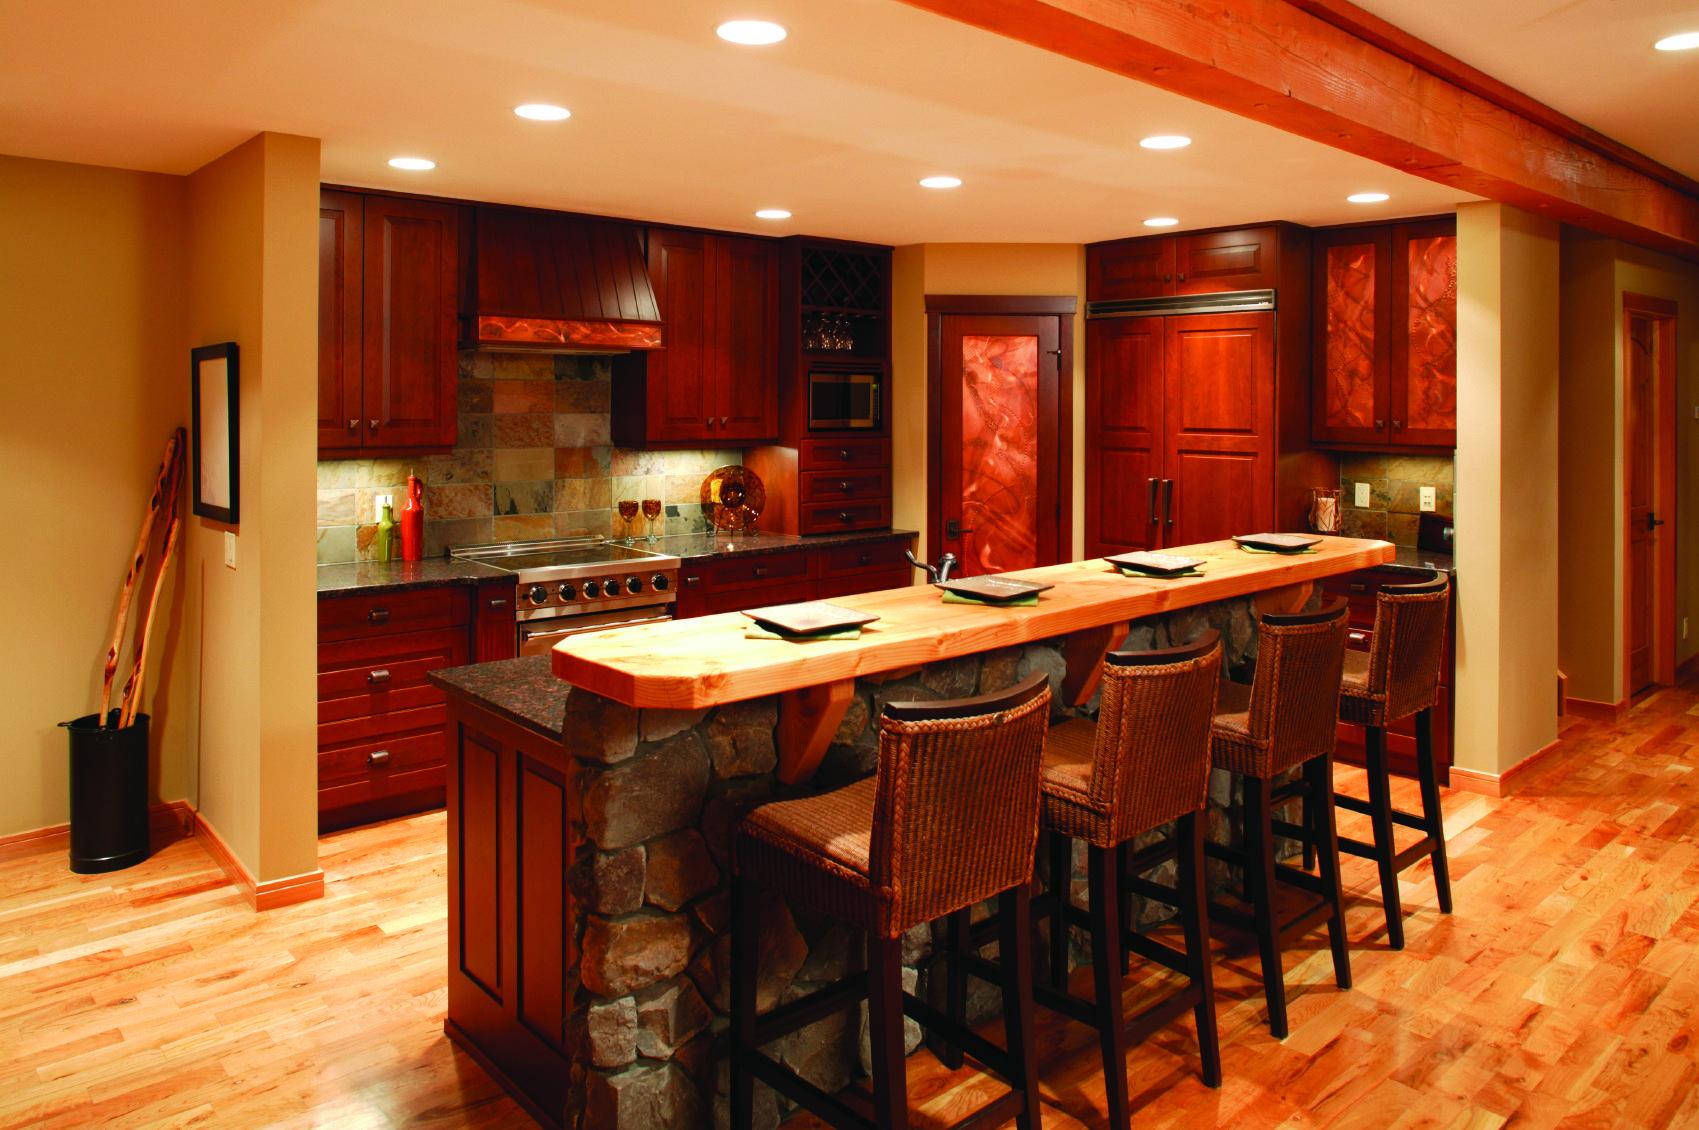 Retrofit Led Downlight For Recessed Lighting Kitchen Remodel Kitchen Flooring Kitchen Island Design